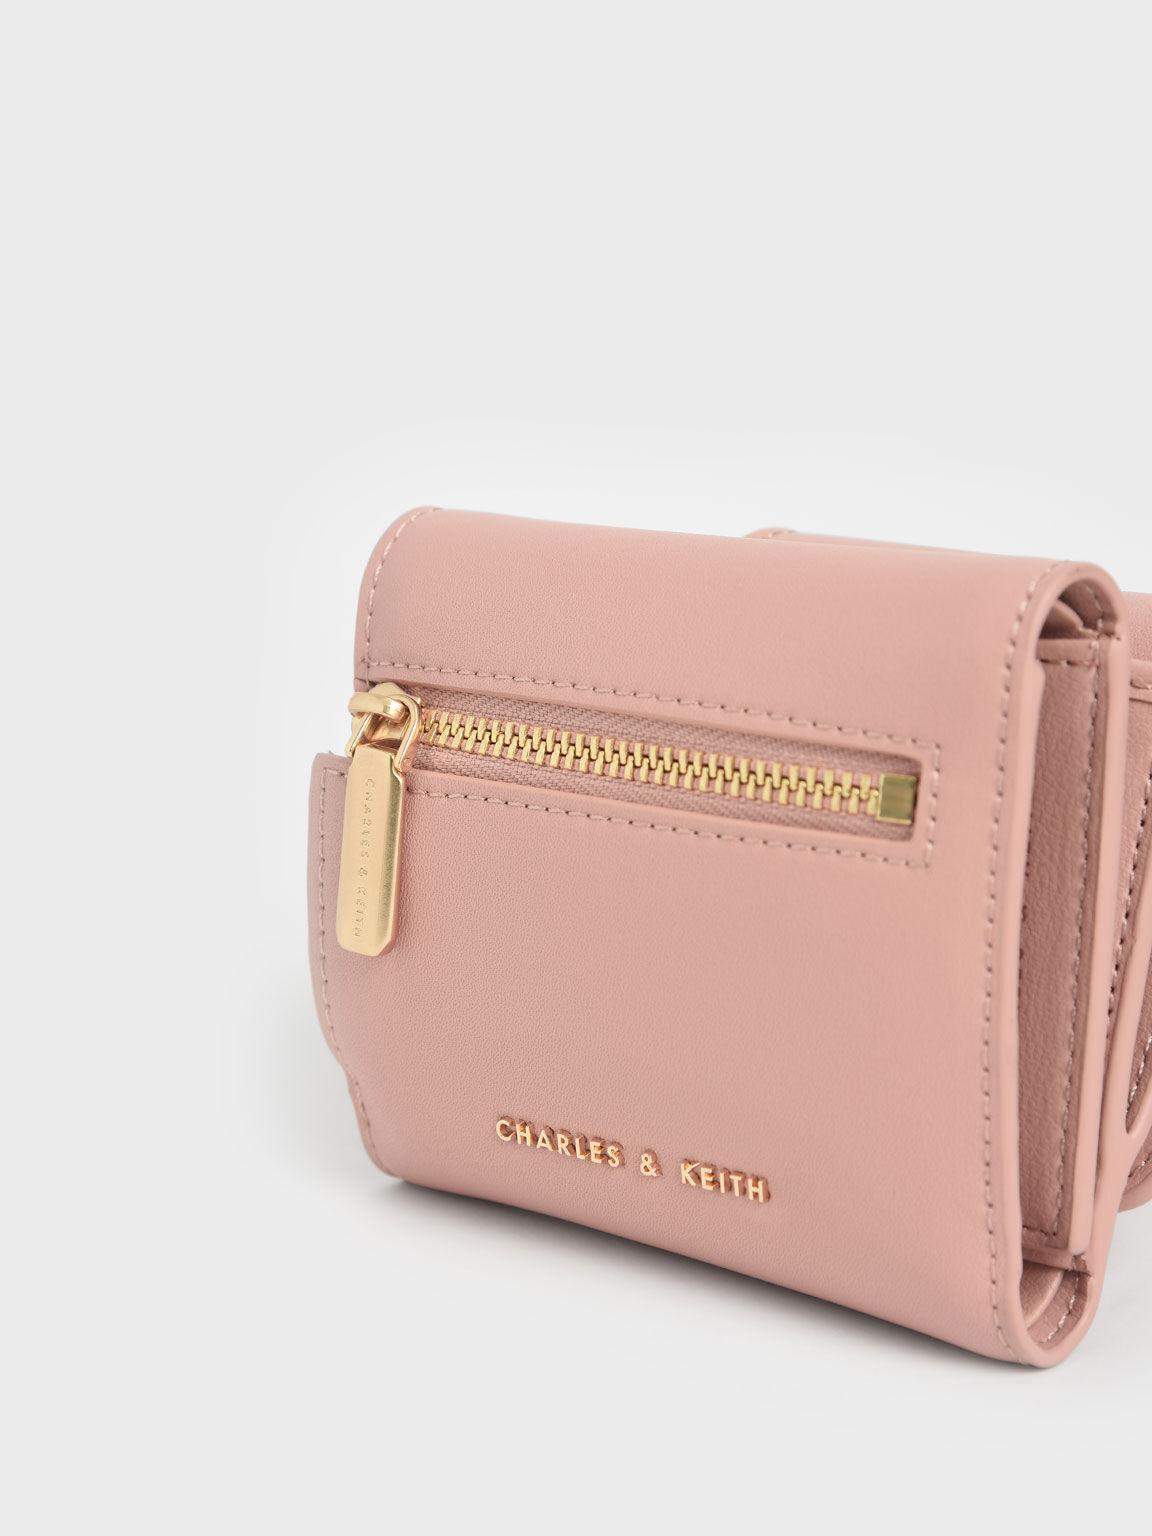 Chain Handle Short Wallet, Blush, hi-res